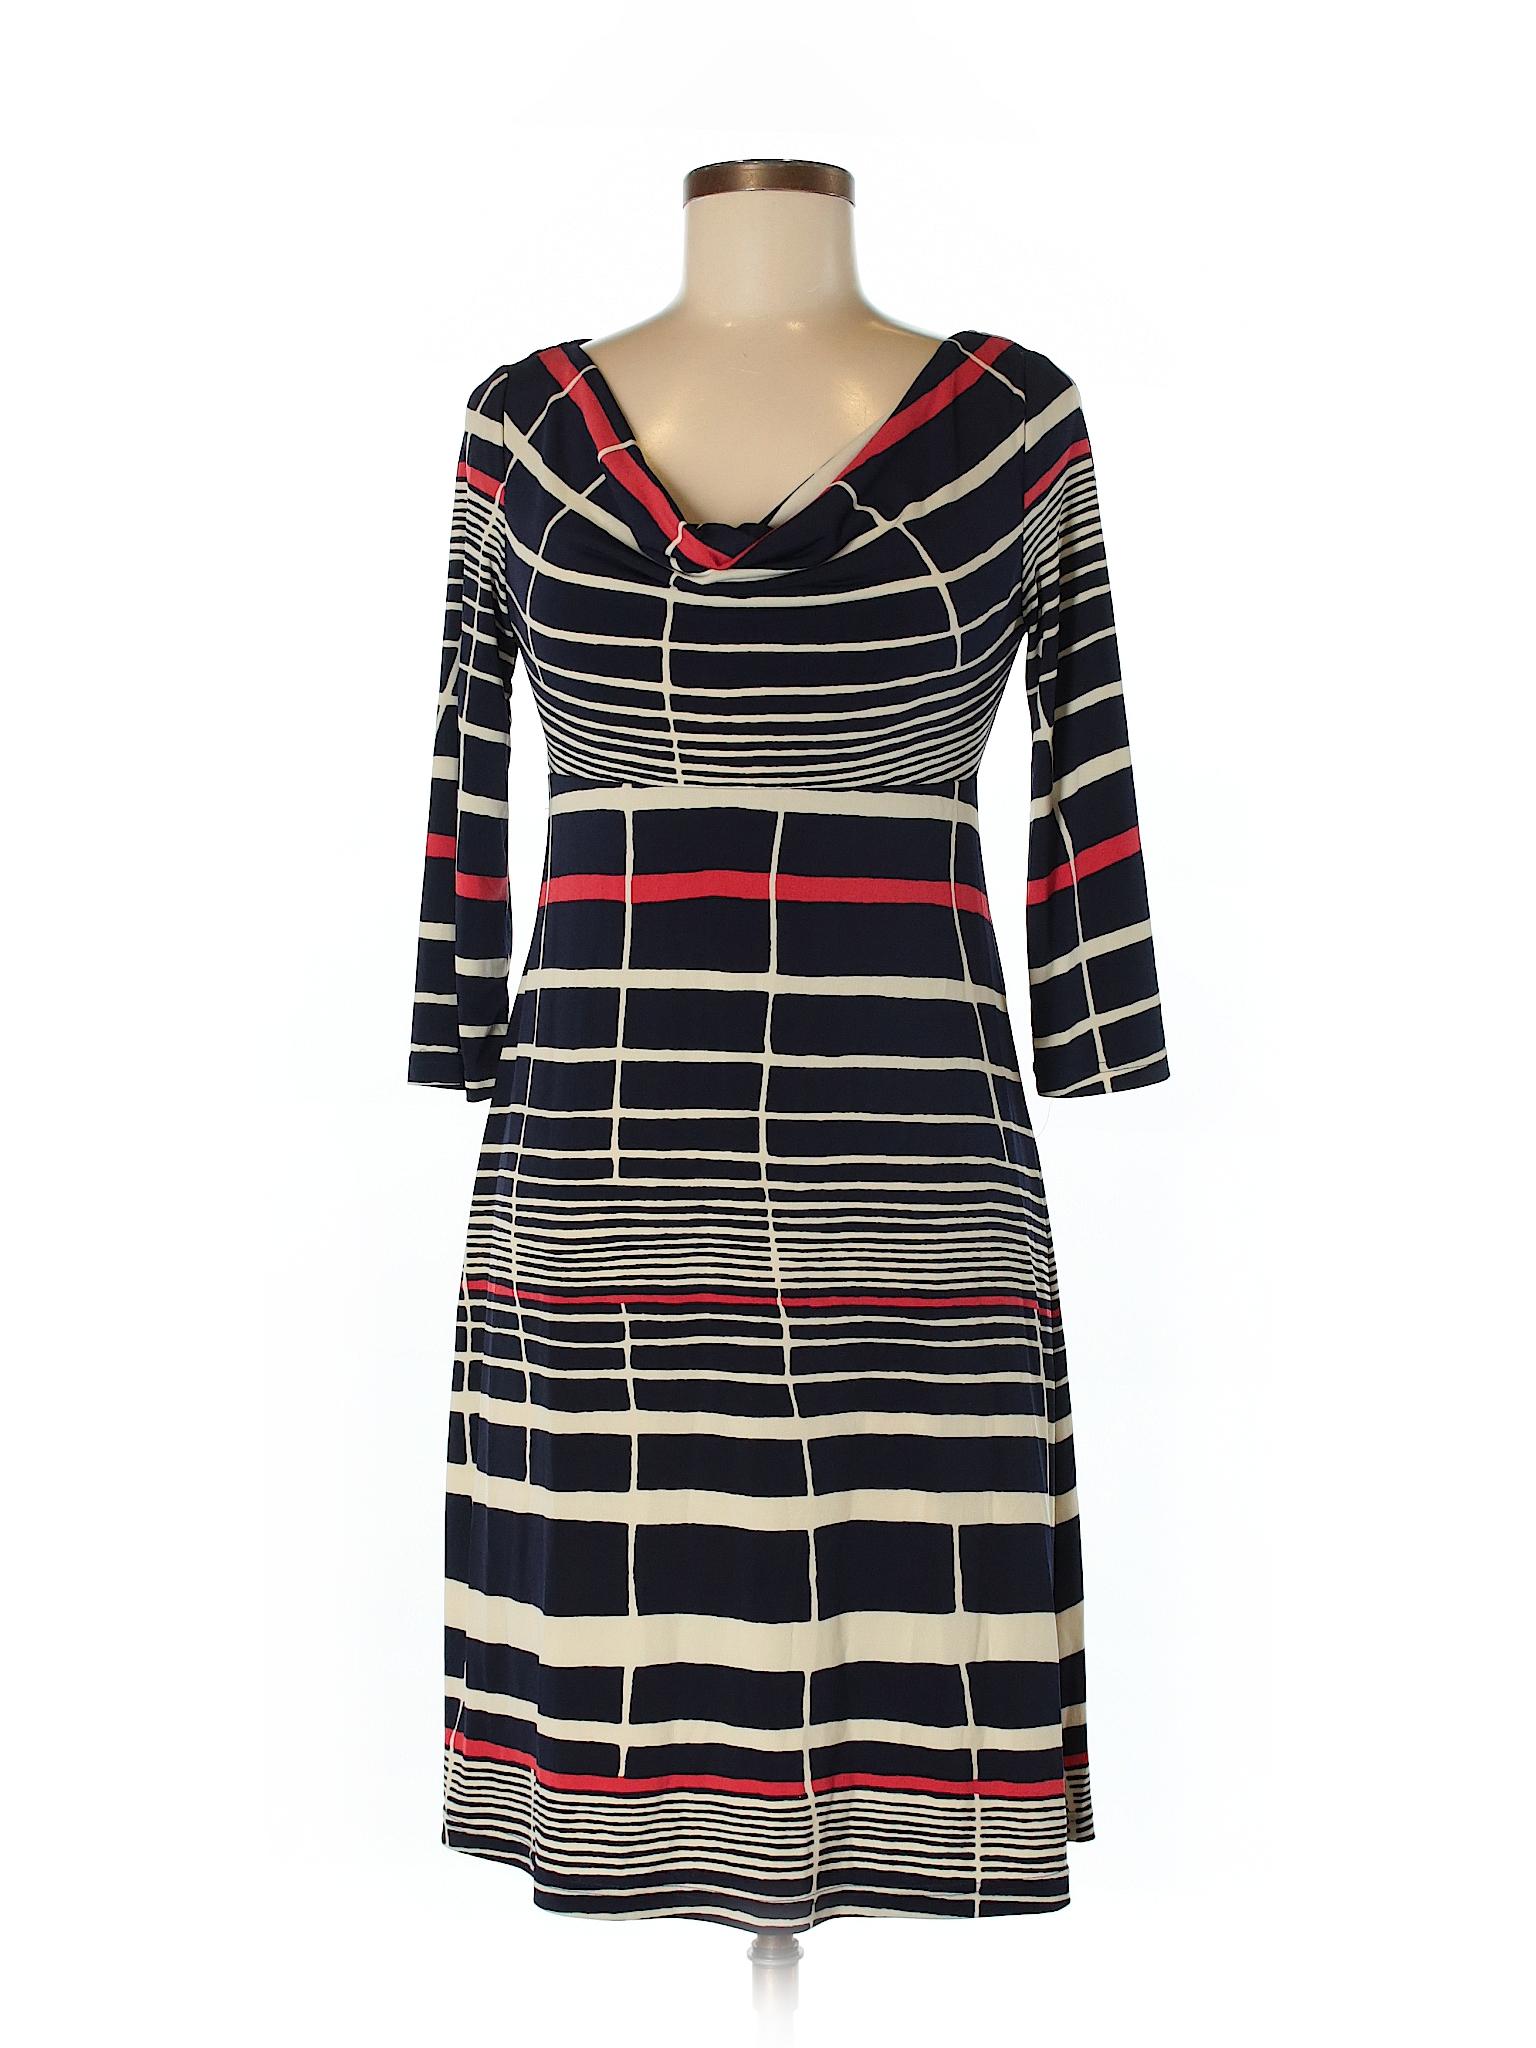 Dress Selling Casual Eliza Selling Eliza J nWqwpU4CC